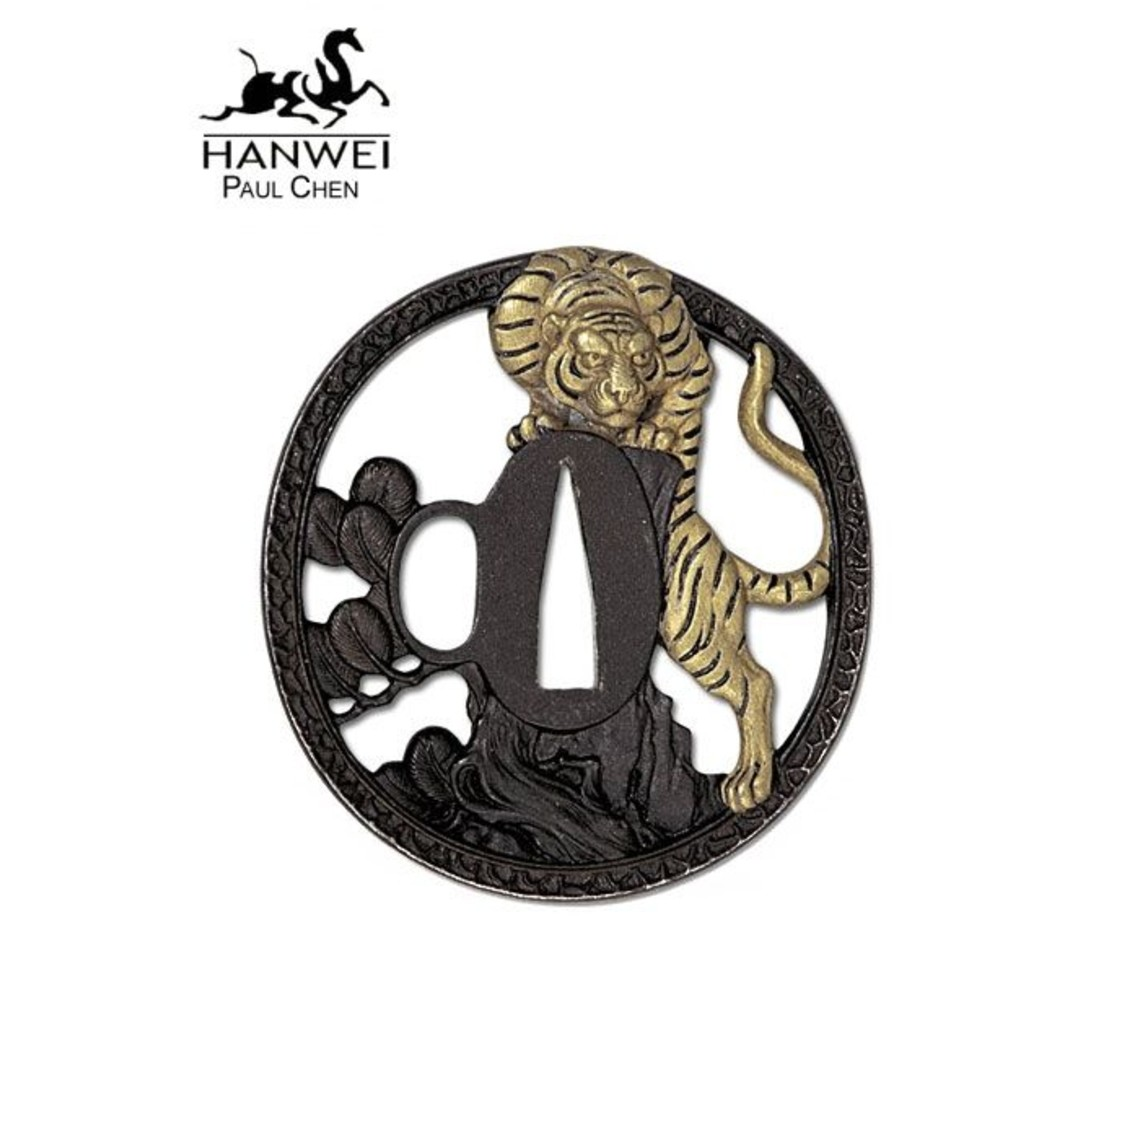 Hanwei Tiger katana élite